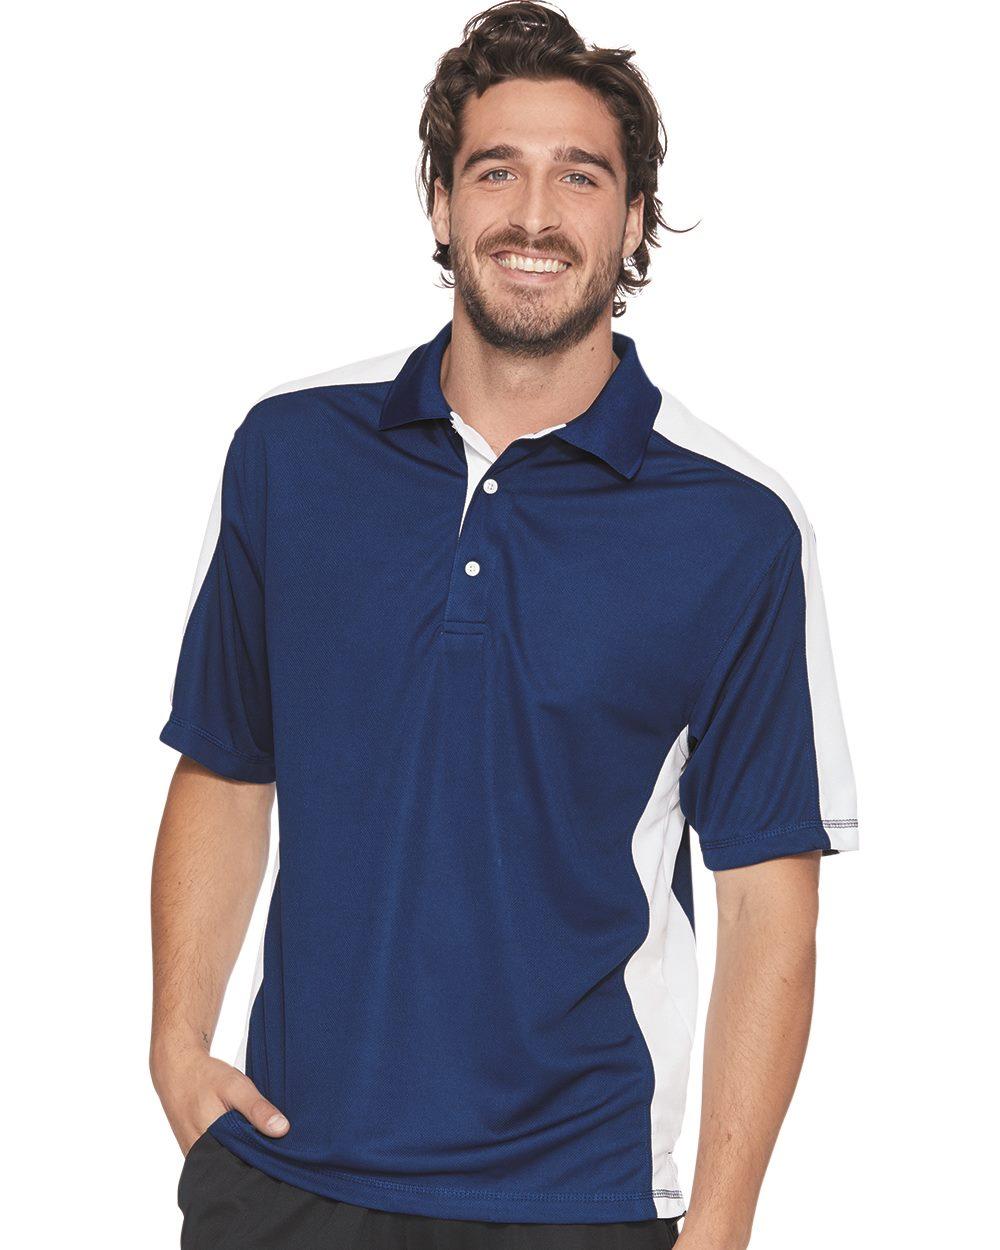 FeatherLite 0465 - Colorblocked Moisture Free Mesh Sport Shirt